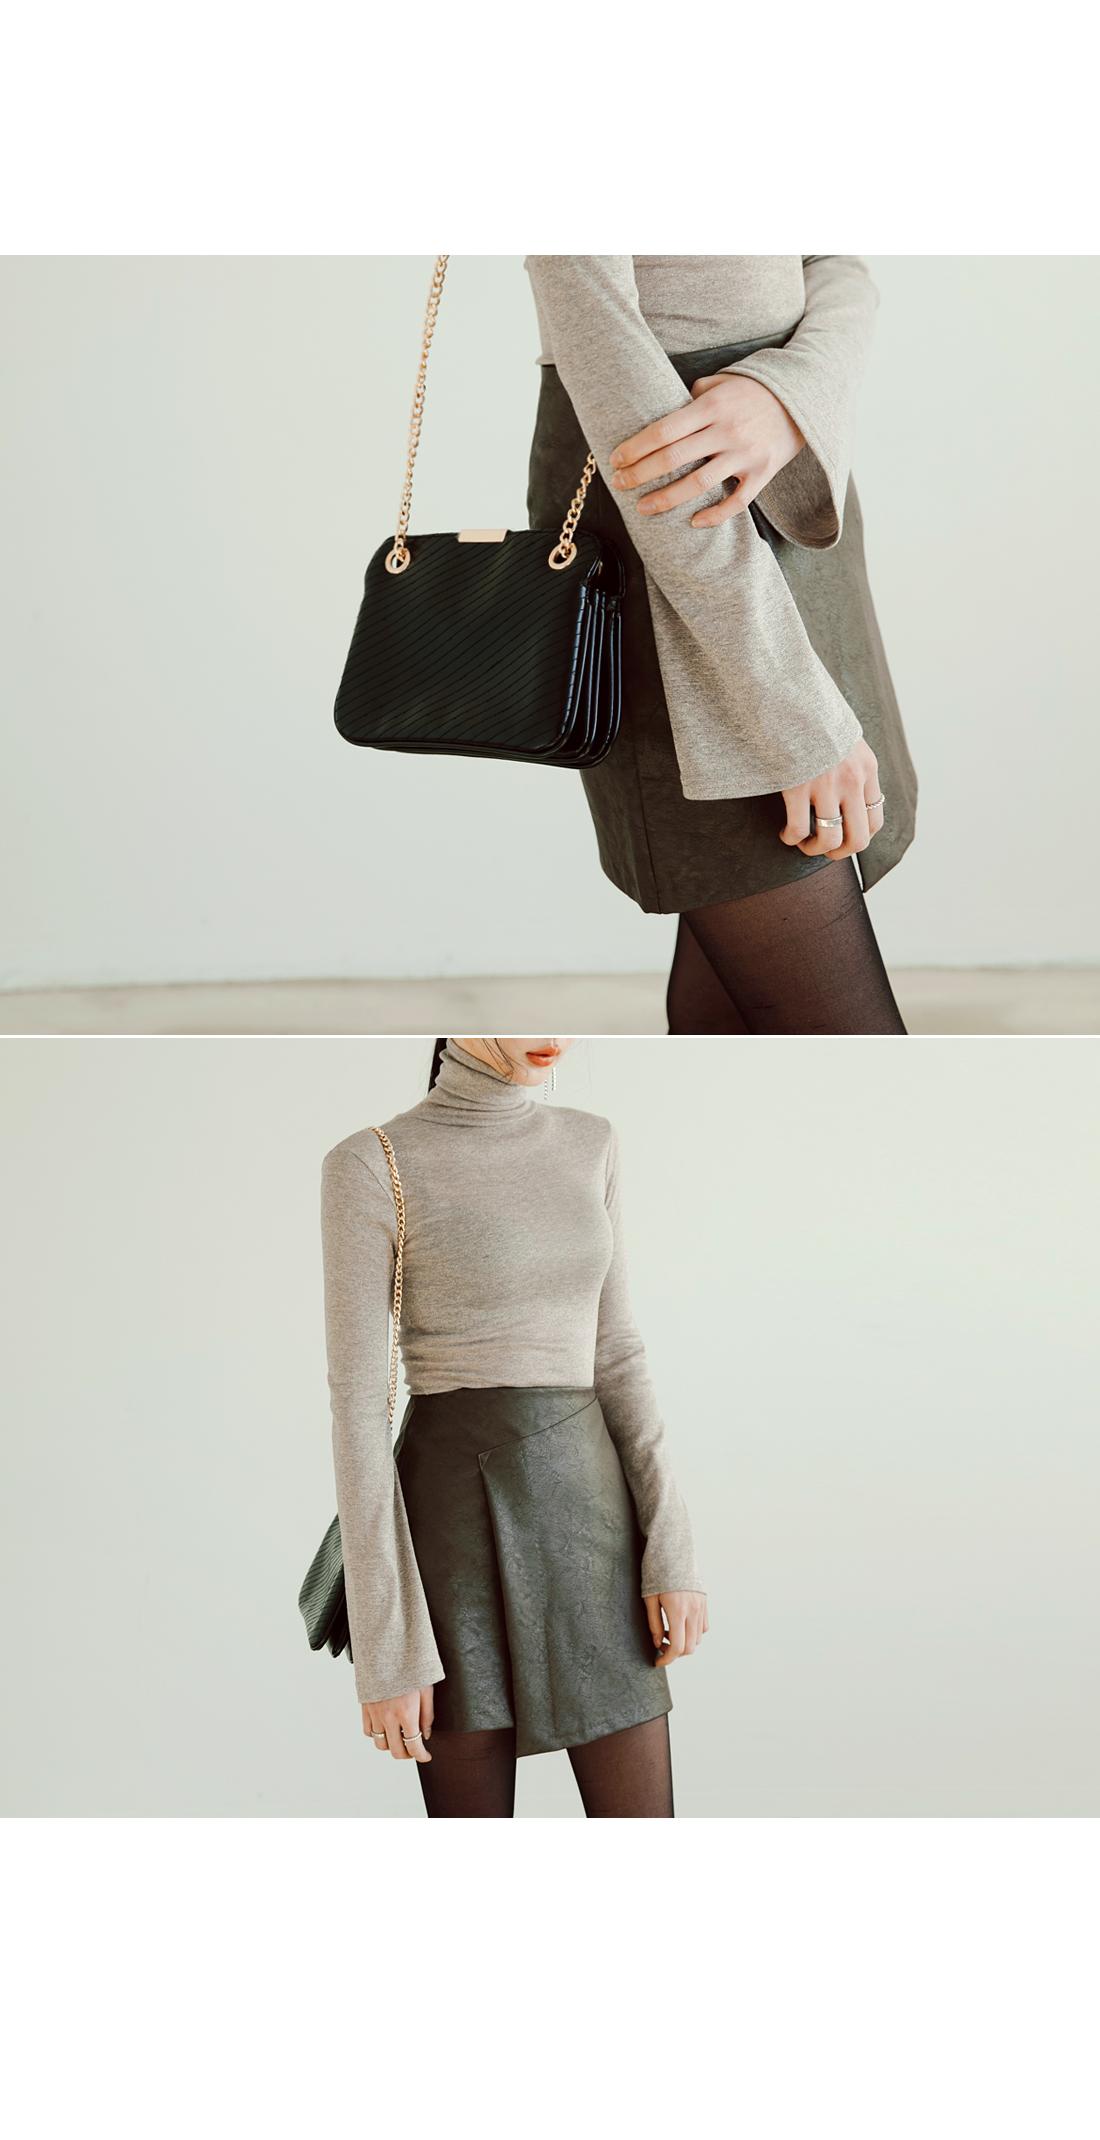 [BAG] TRIO CHAIN BAG